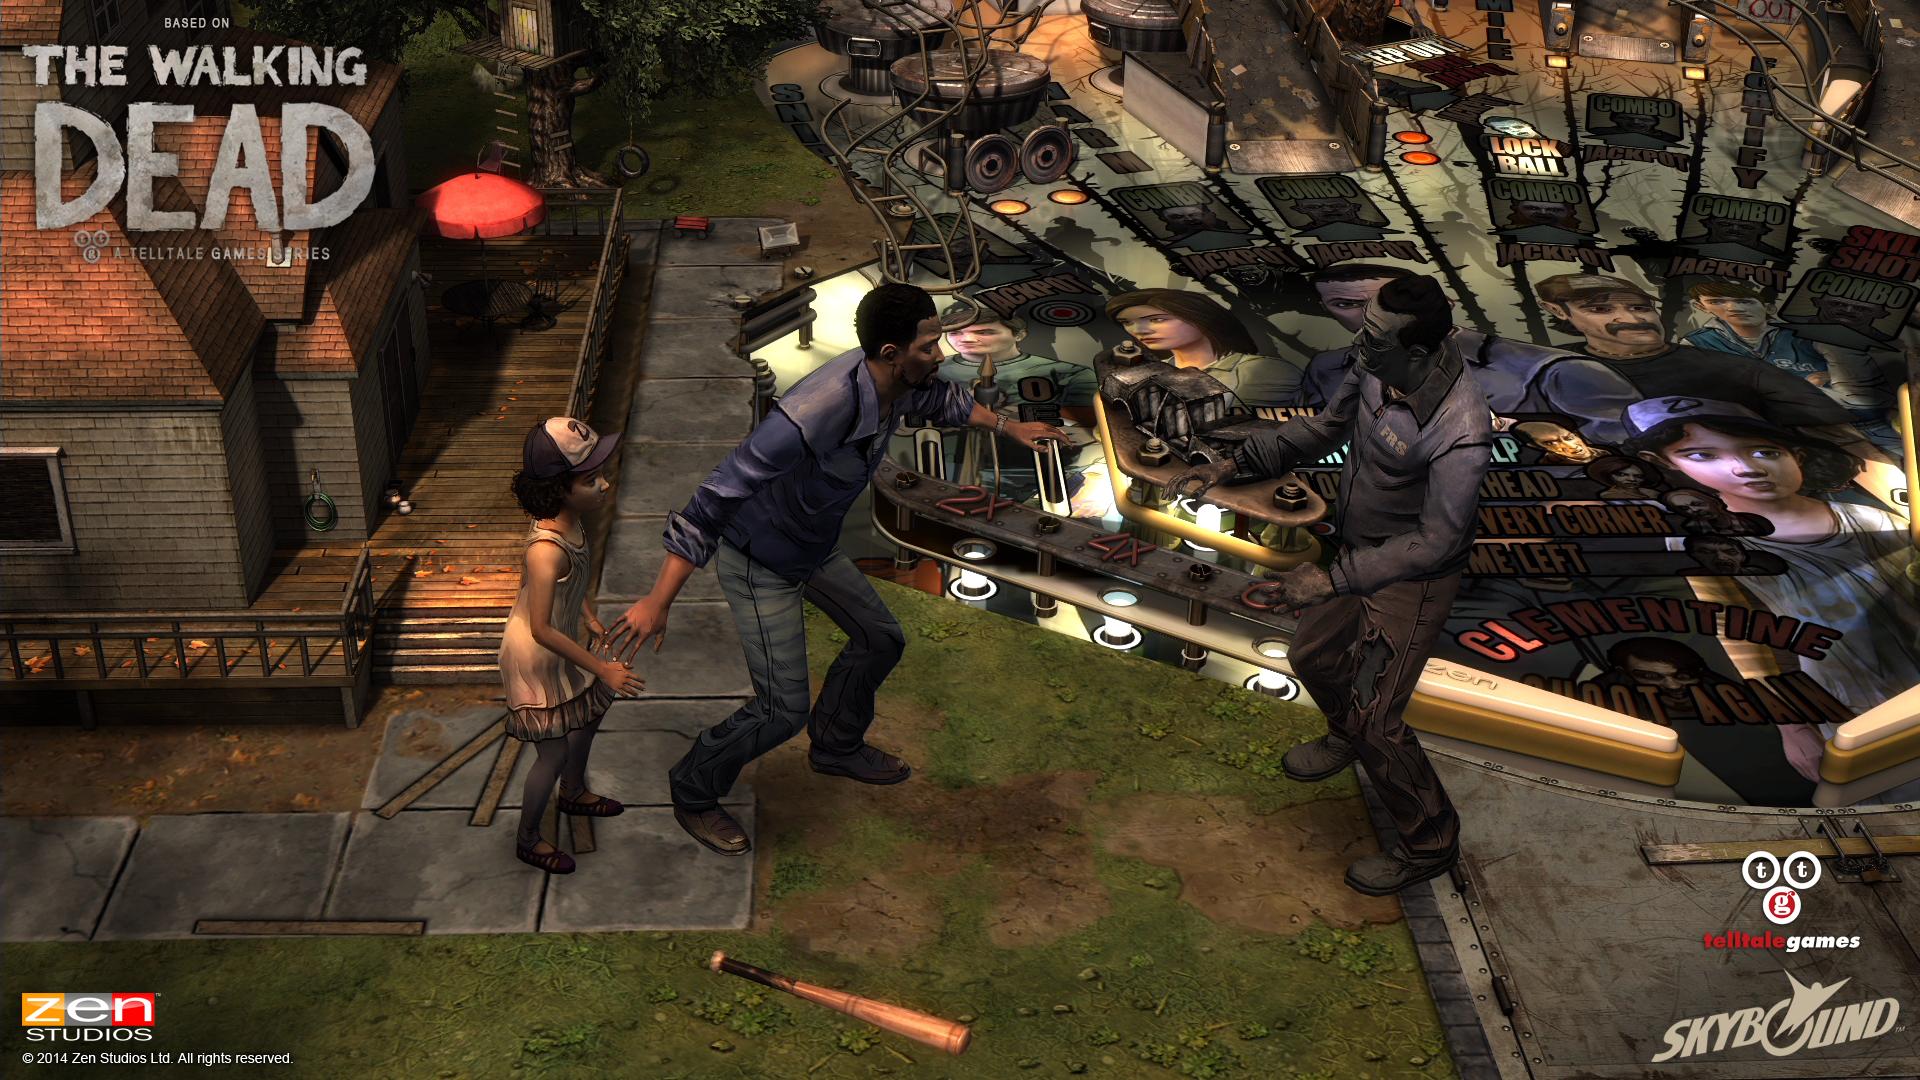 Zen Pinball 2 – The Walking Dead PS Vita 01